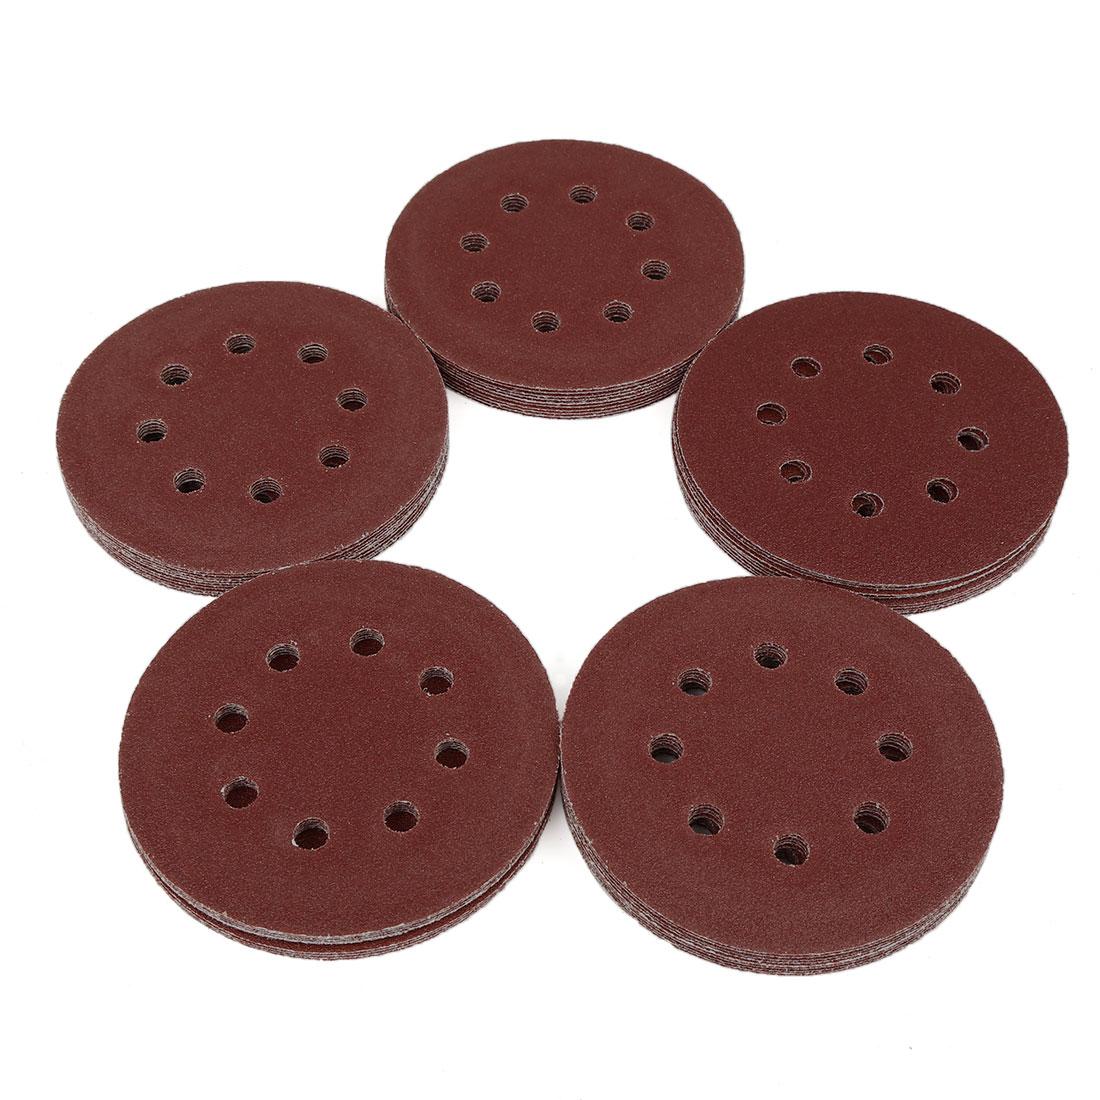 50pcs 5 Inch 8 Hole Hook and Loop Sanding Discs Sander Pads 80 Grit Sandpaper